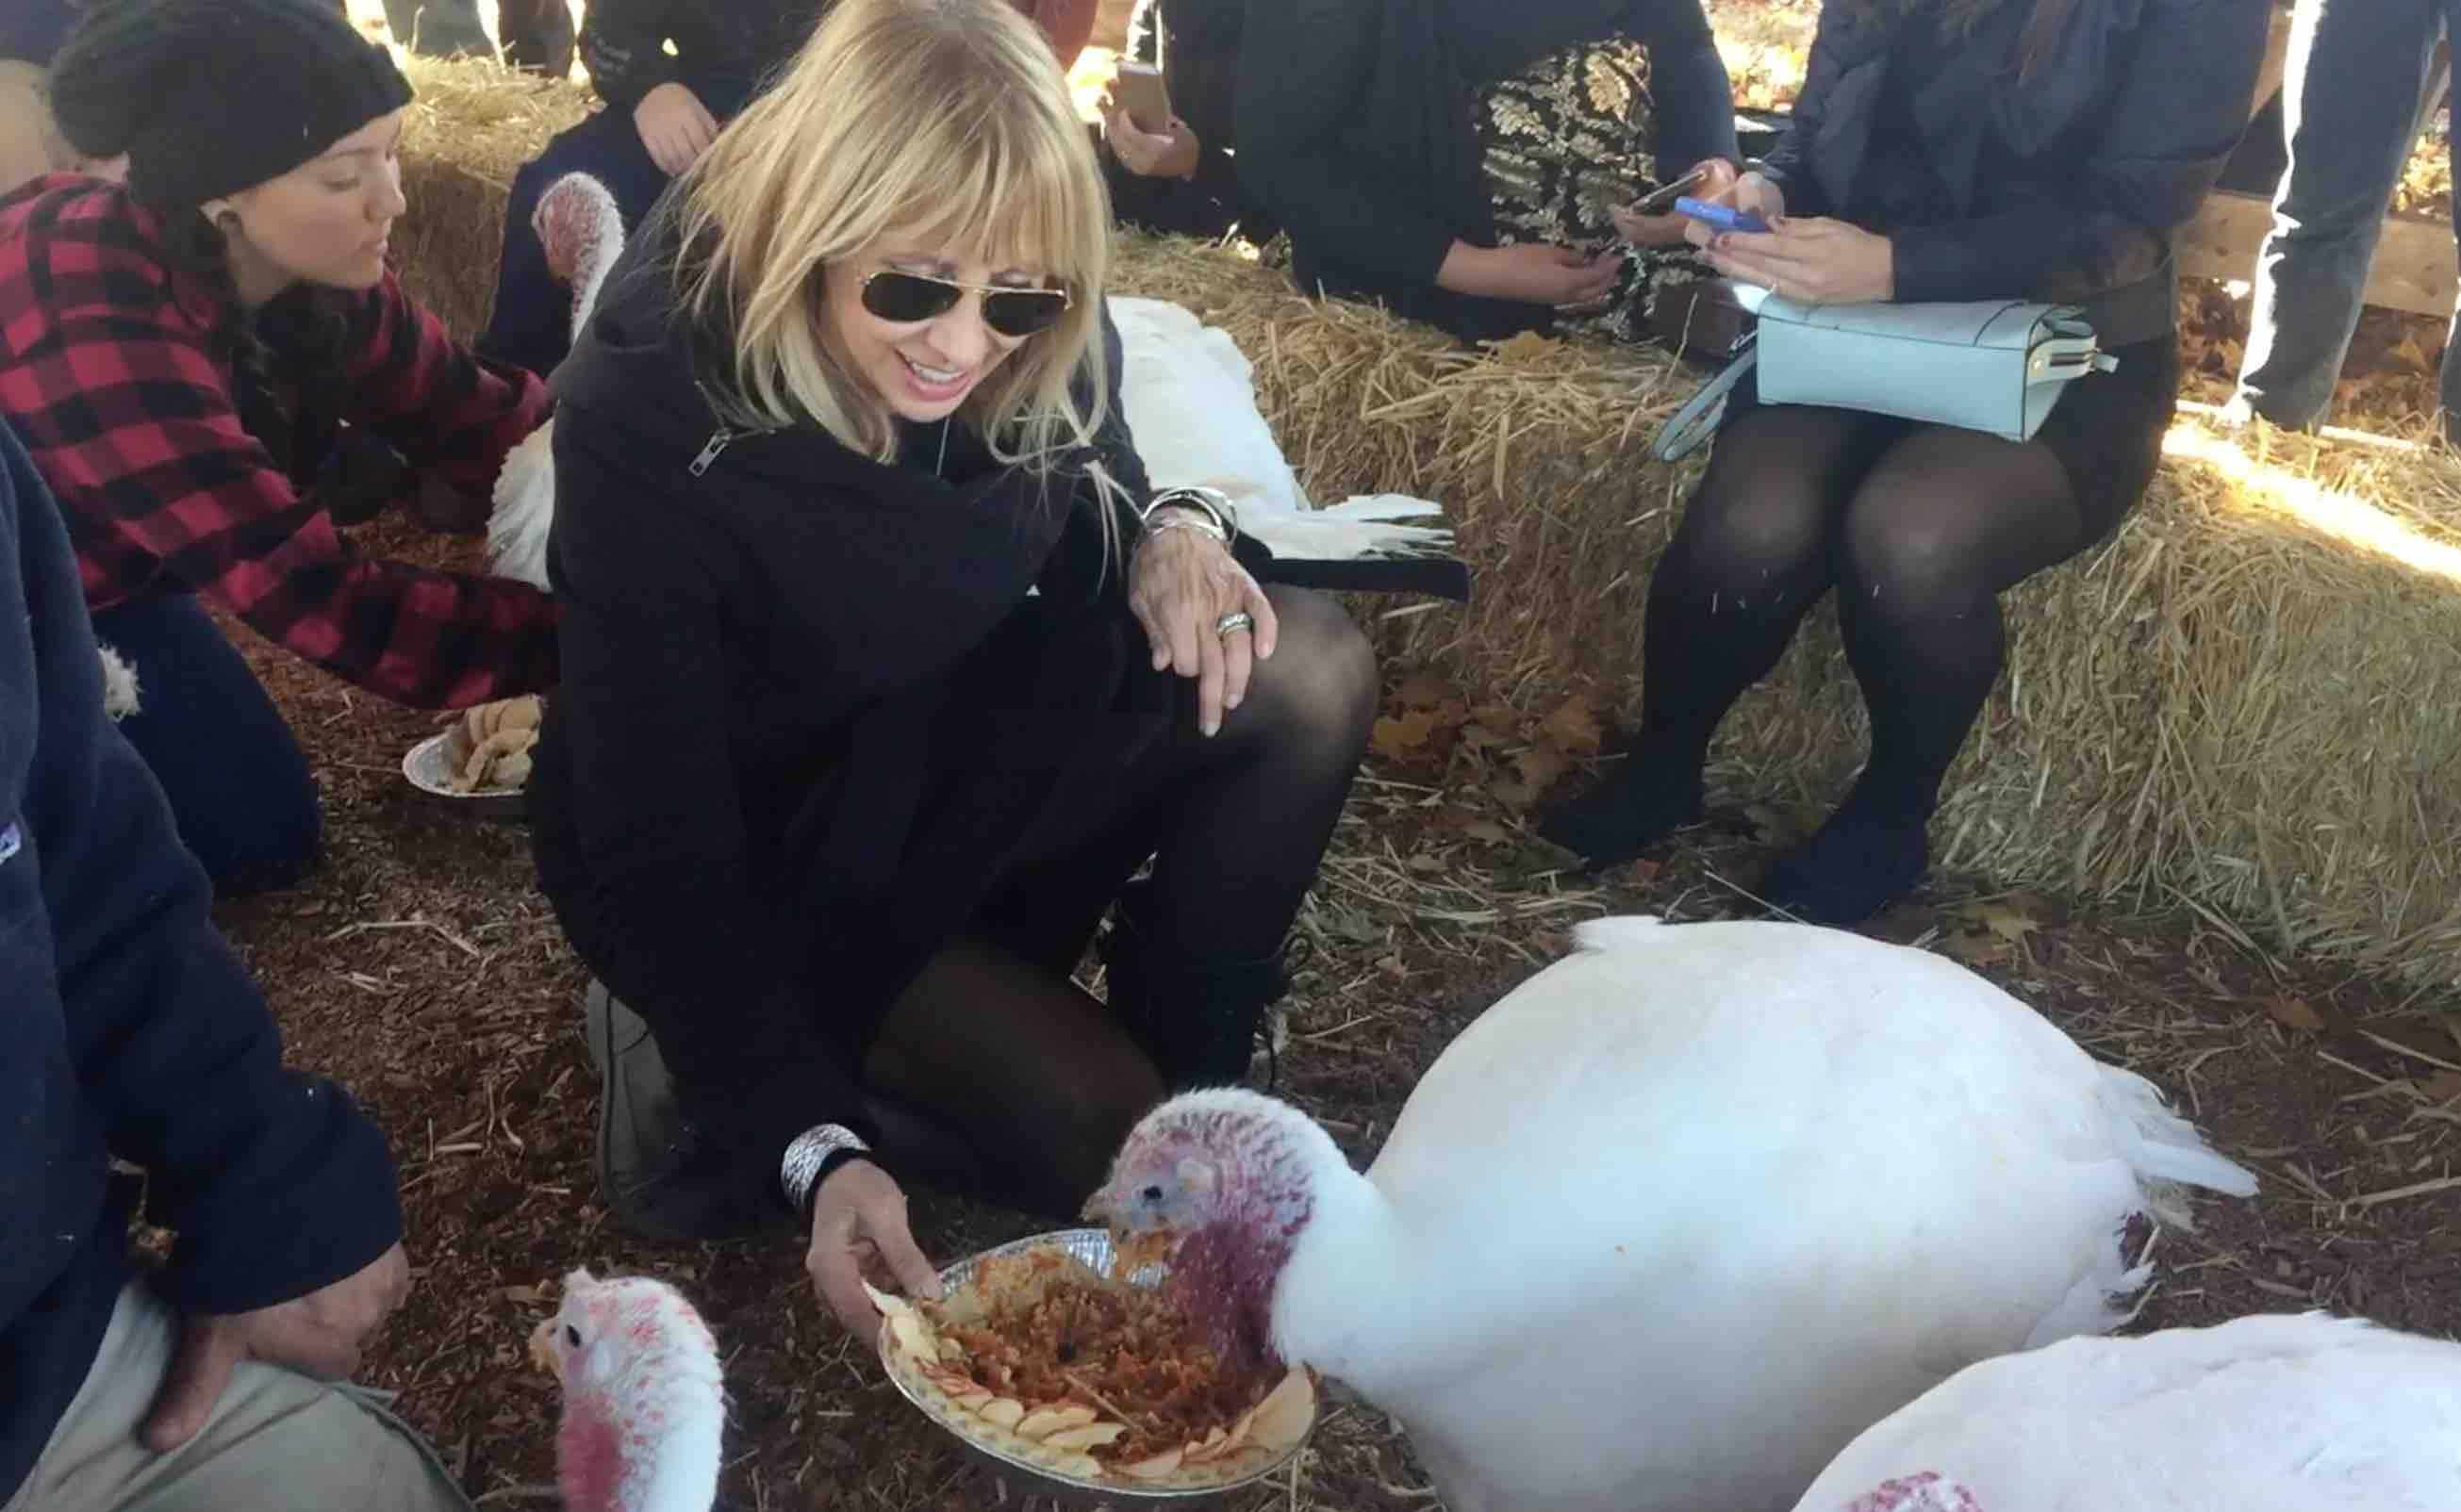 Feeding the turkeys at Woodstock Farm Sanctuary is an annual ThanksLiving ritual